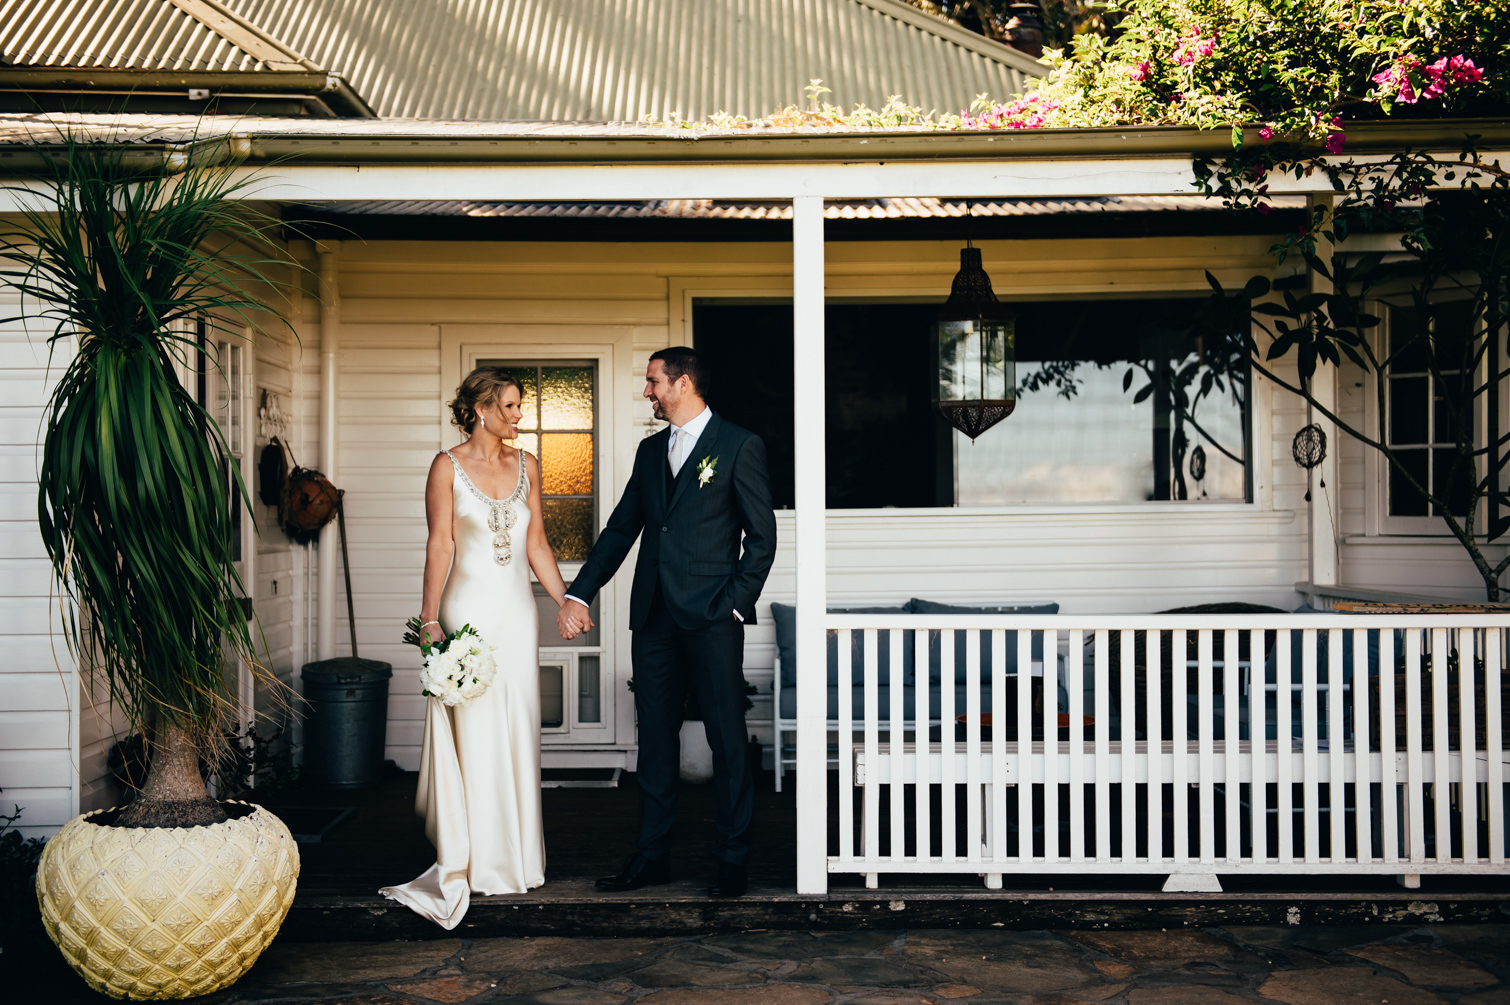 Byron_View_Wedding_Venue-25.jpg